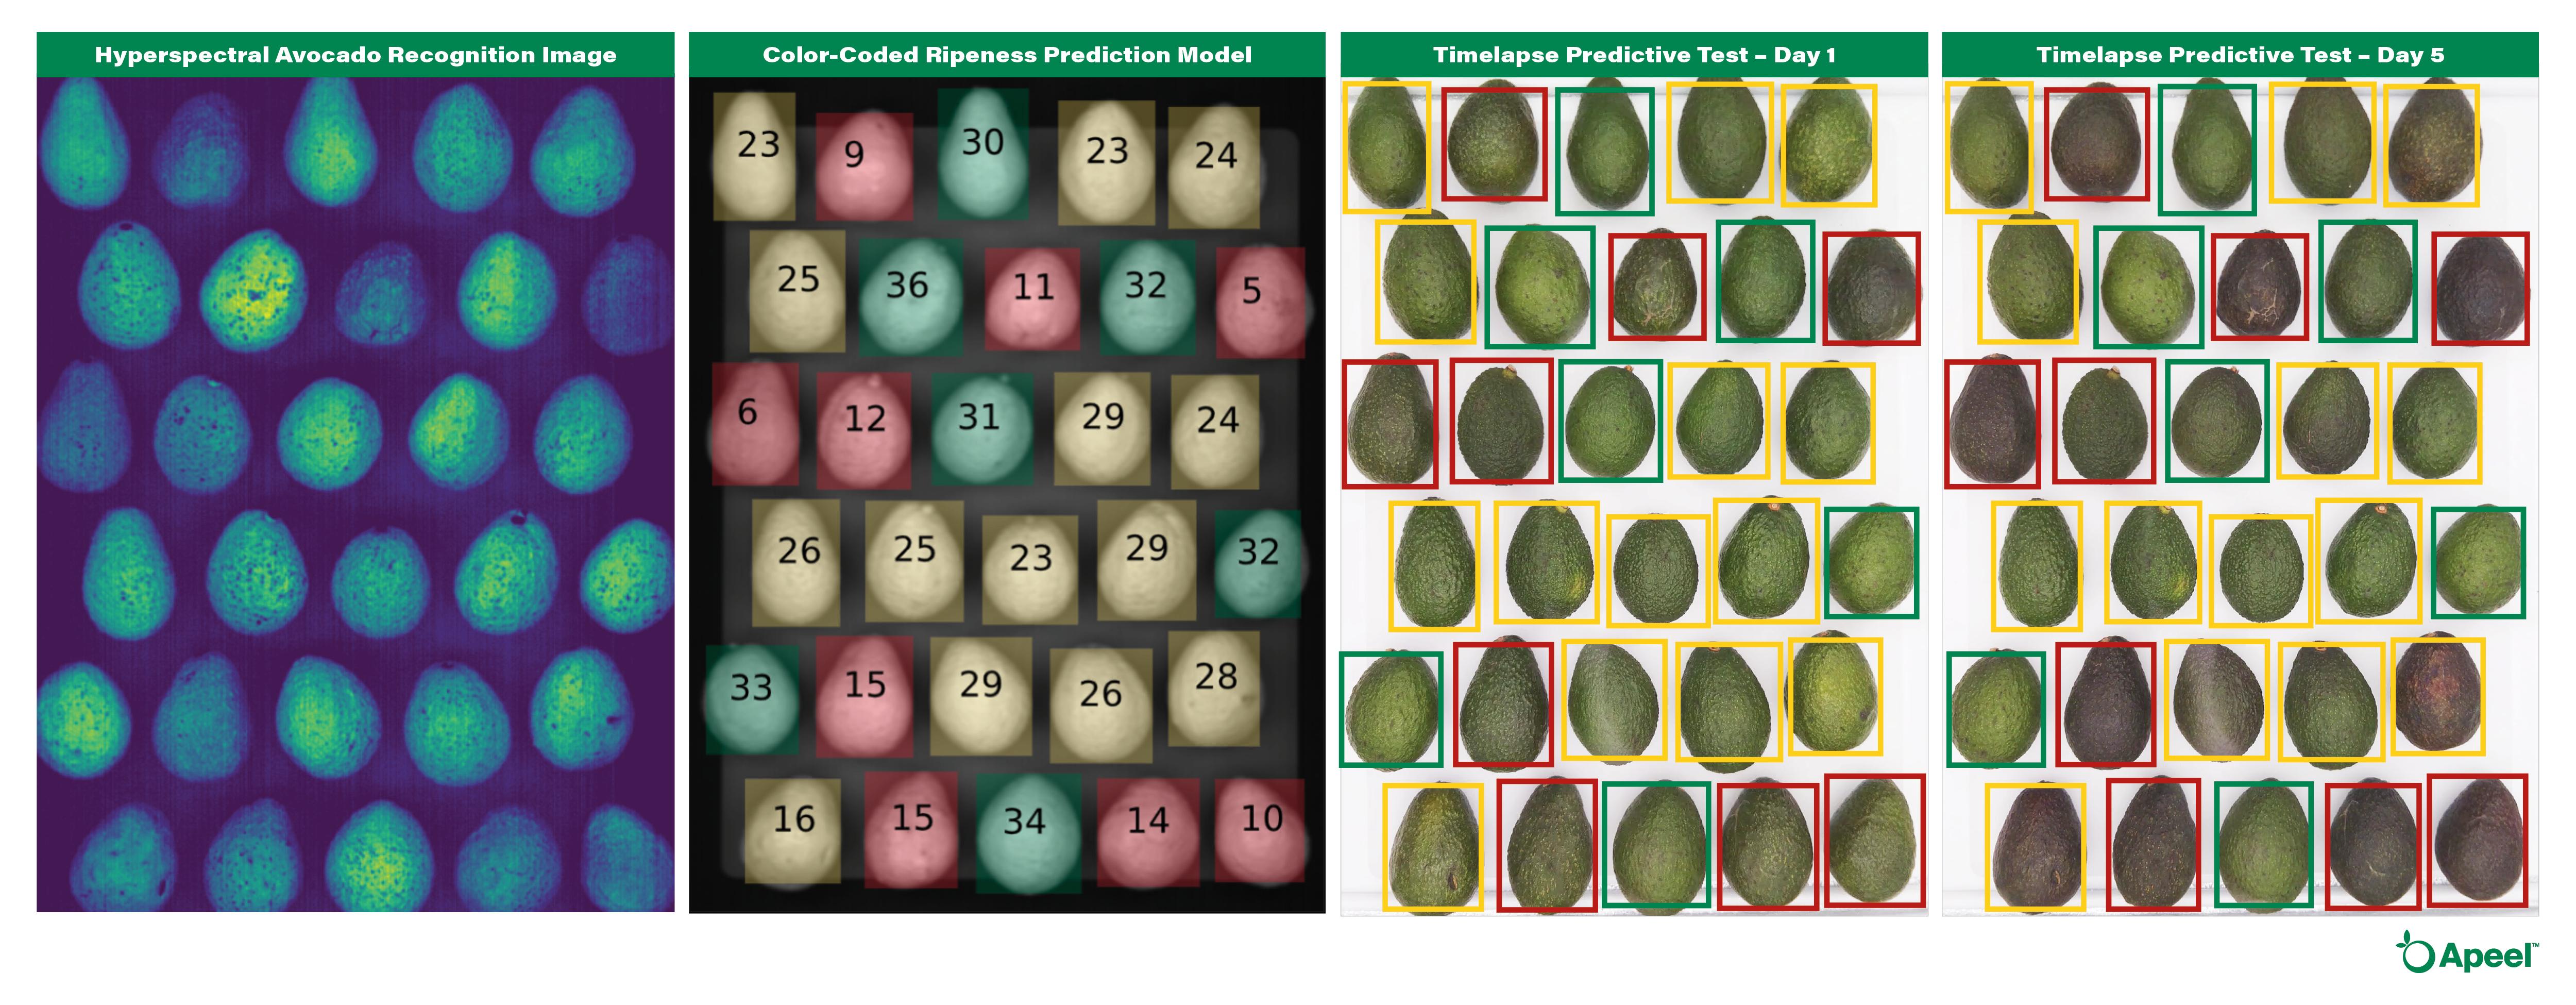 Apeel-ImpactVision-Comparison-for-Blog